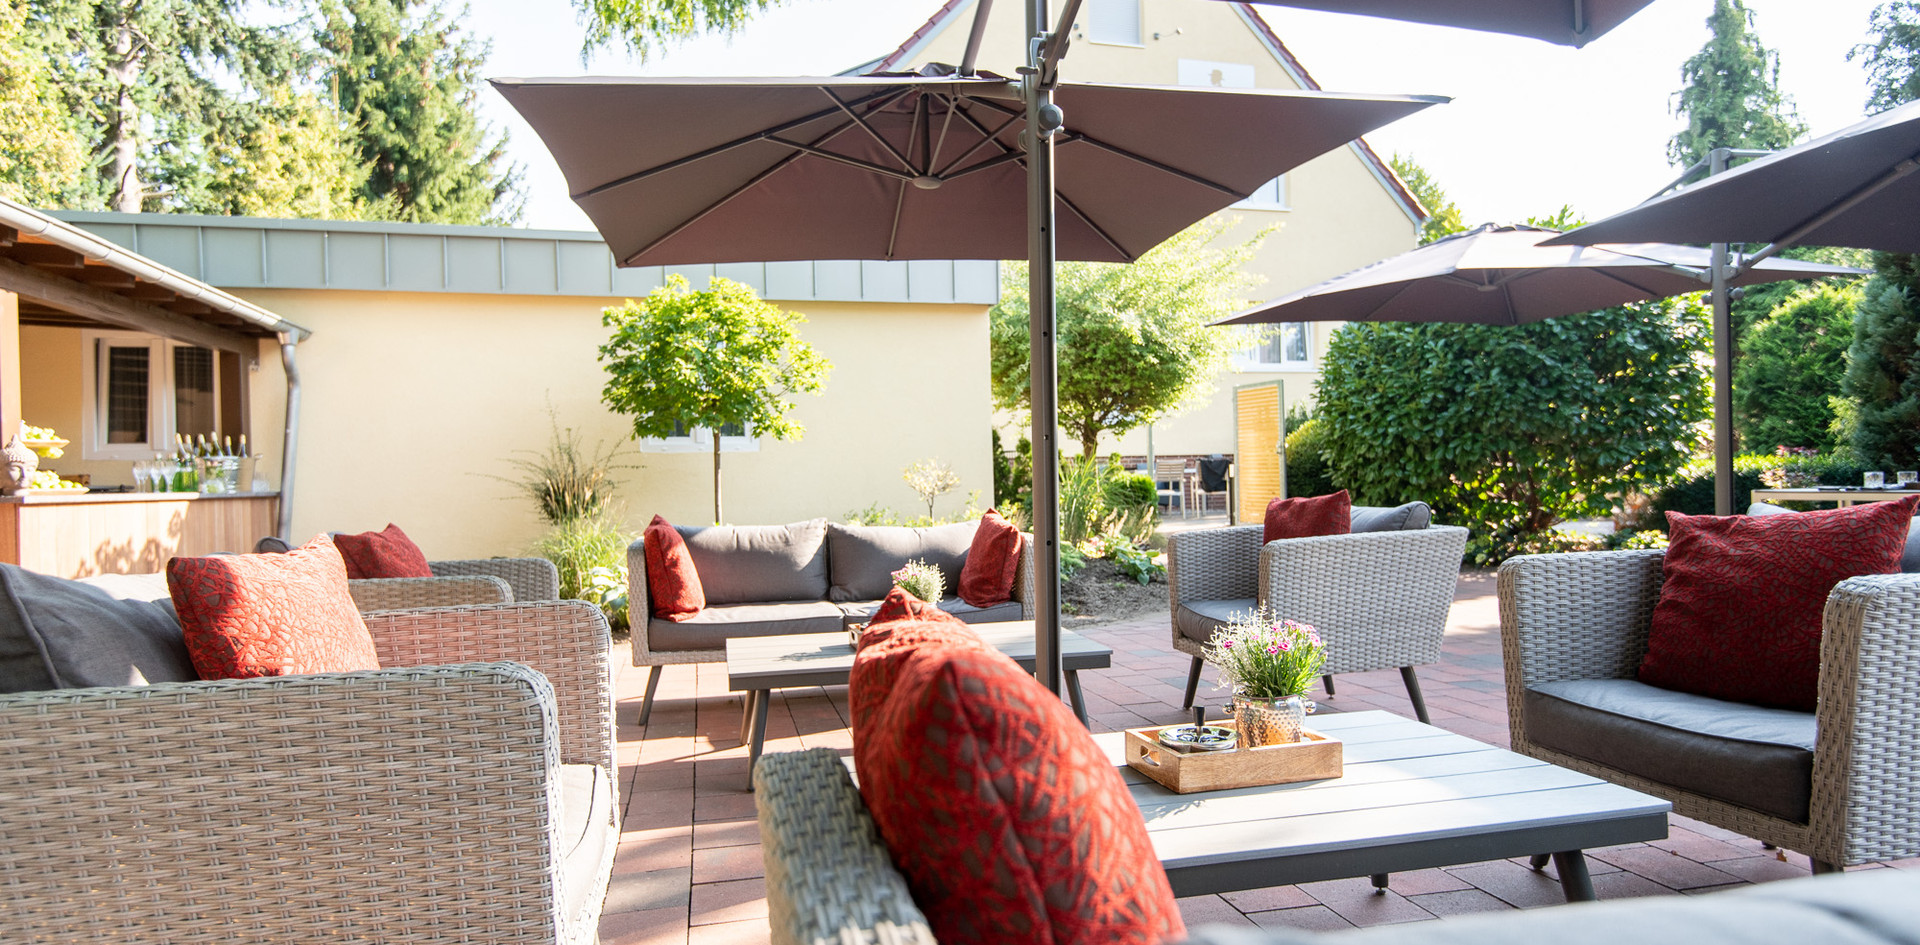 Sitzgelegenheit Gartenterrasse Hotel Wegner - the culinary art hotel